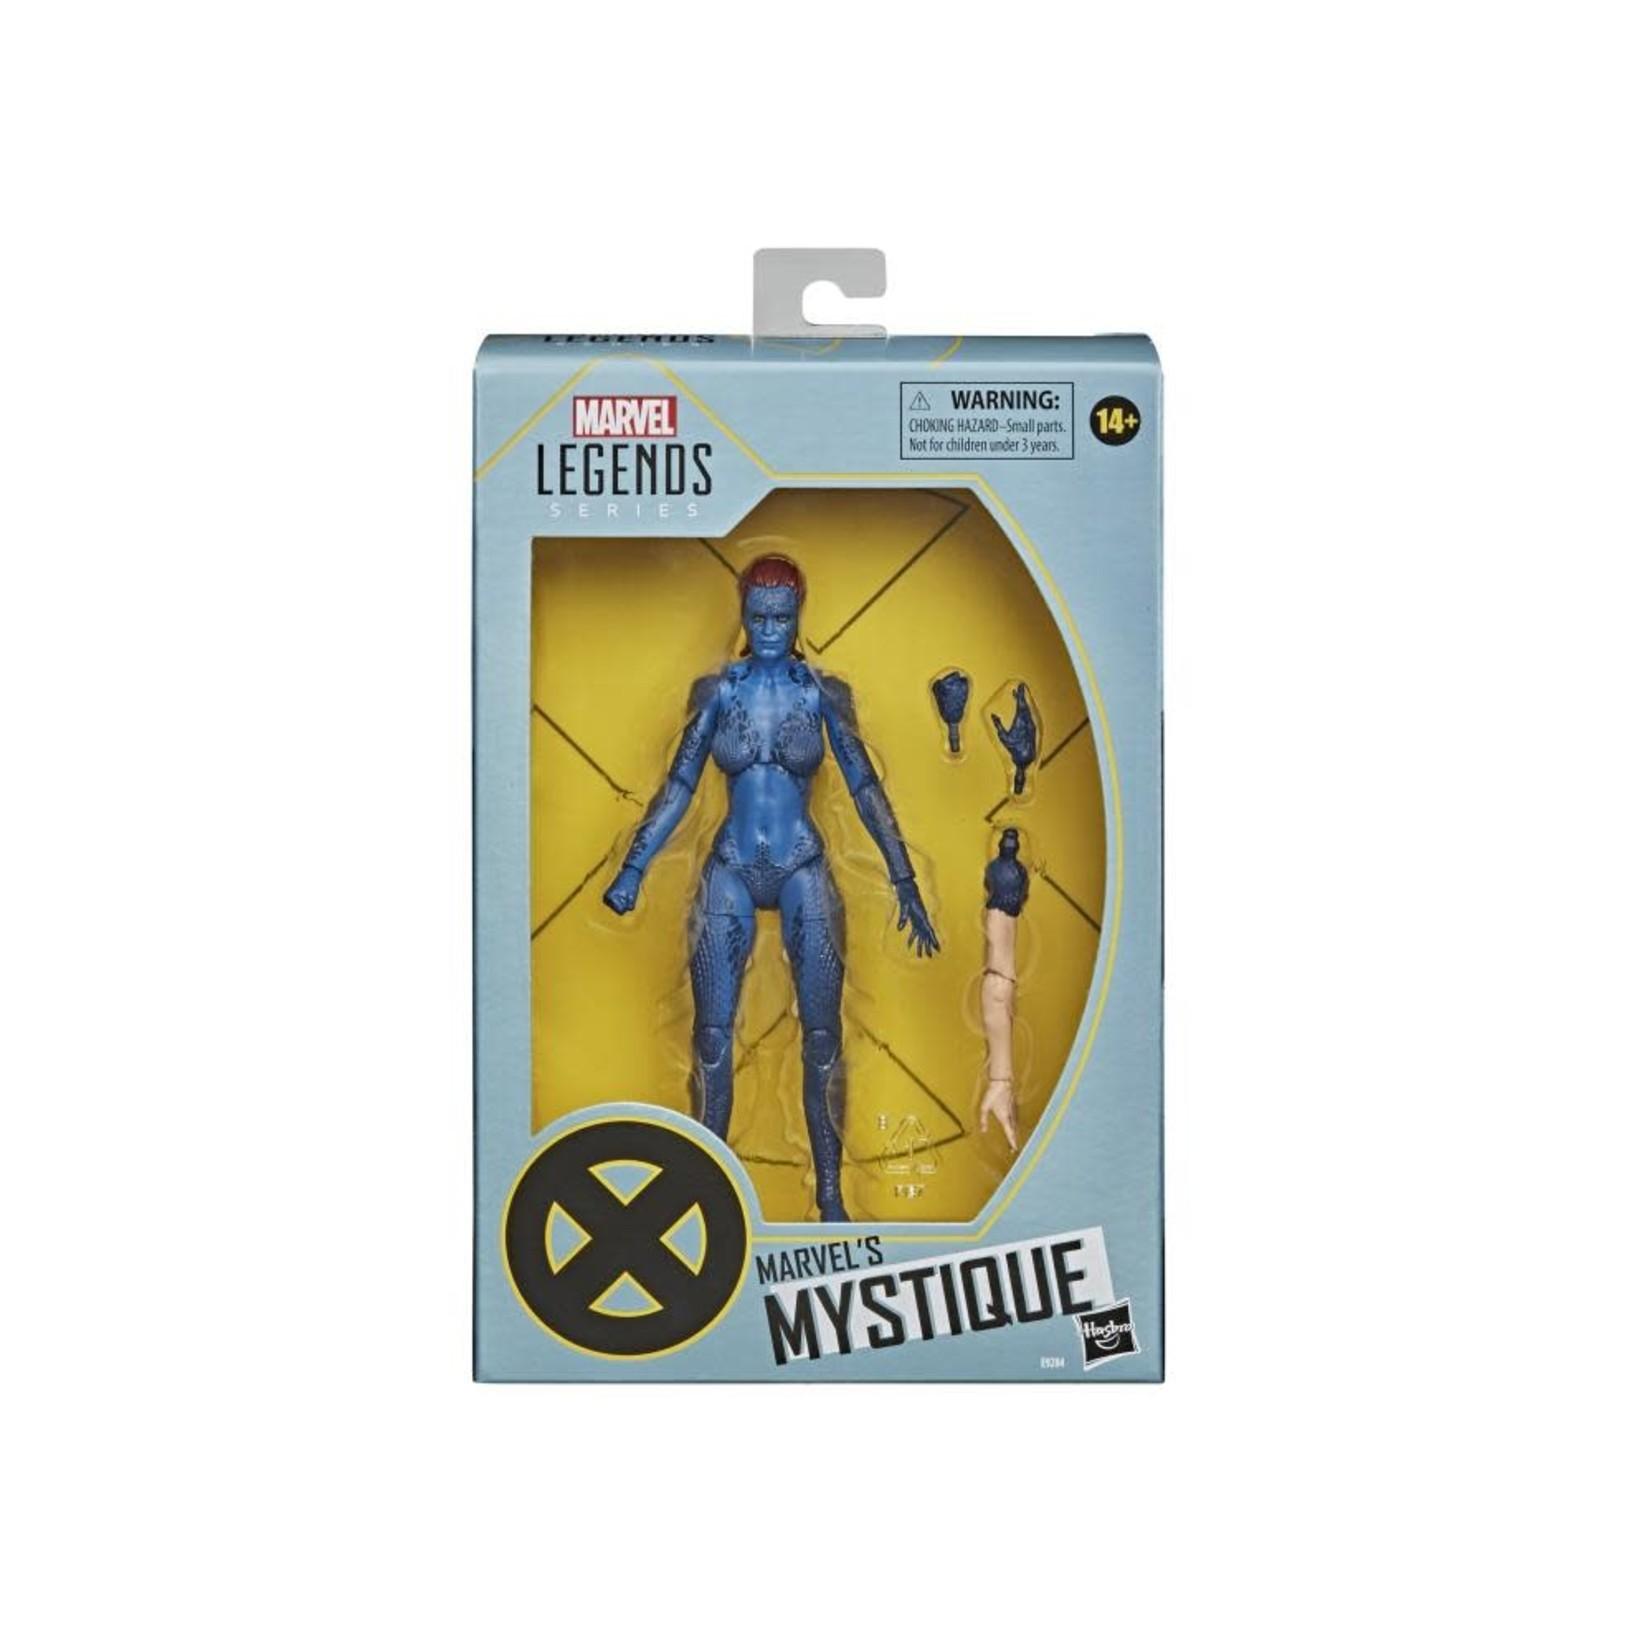 Hasbro X-Men (2000) 20th Anniversary Marvel Legends Mystique